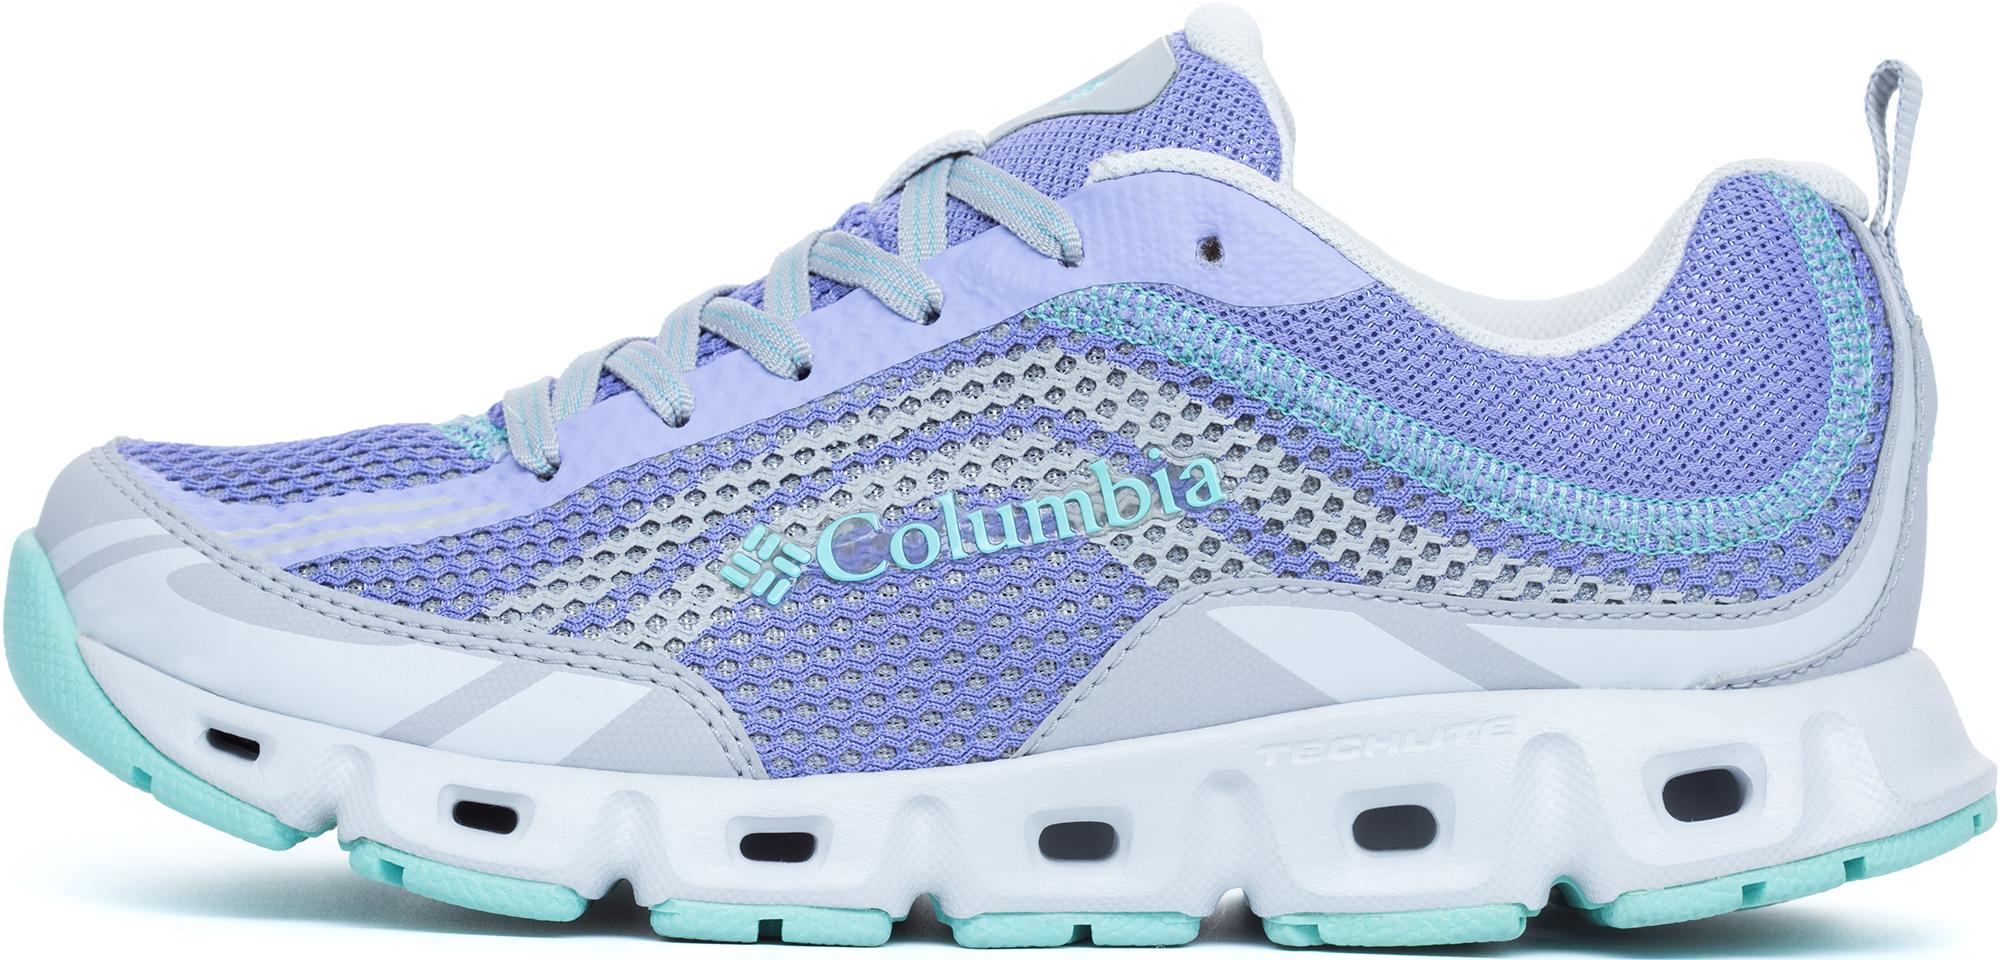 Columbia Полуботинки женские Columbia Drainmaker IV, размер 41 columbia ботинки утепленные женские columbia bugaboot plus iv omni heat размер 41